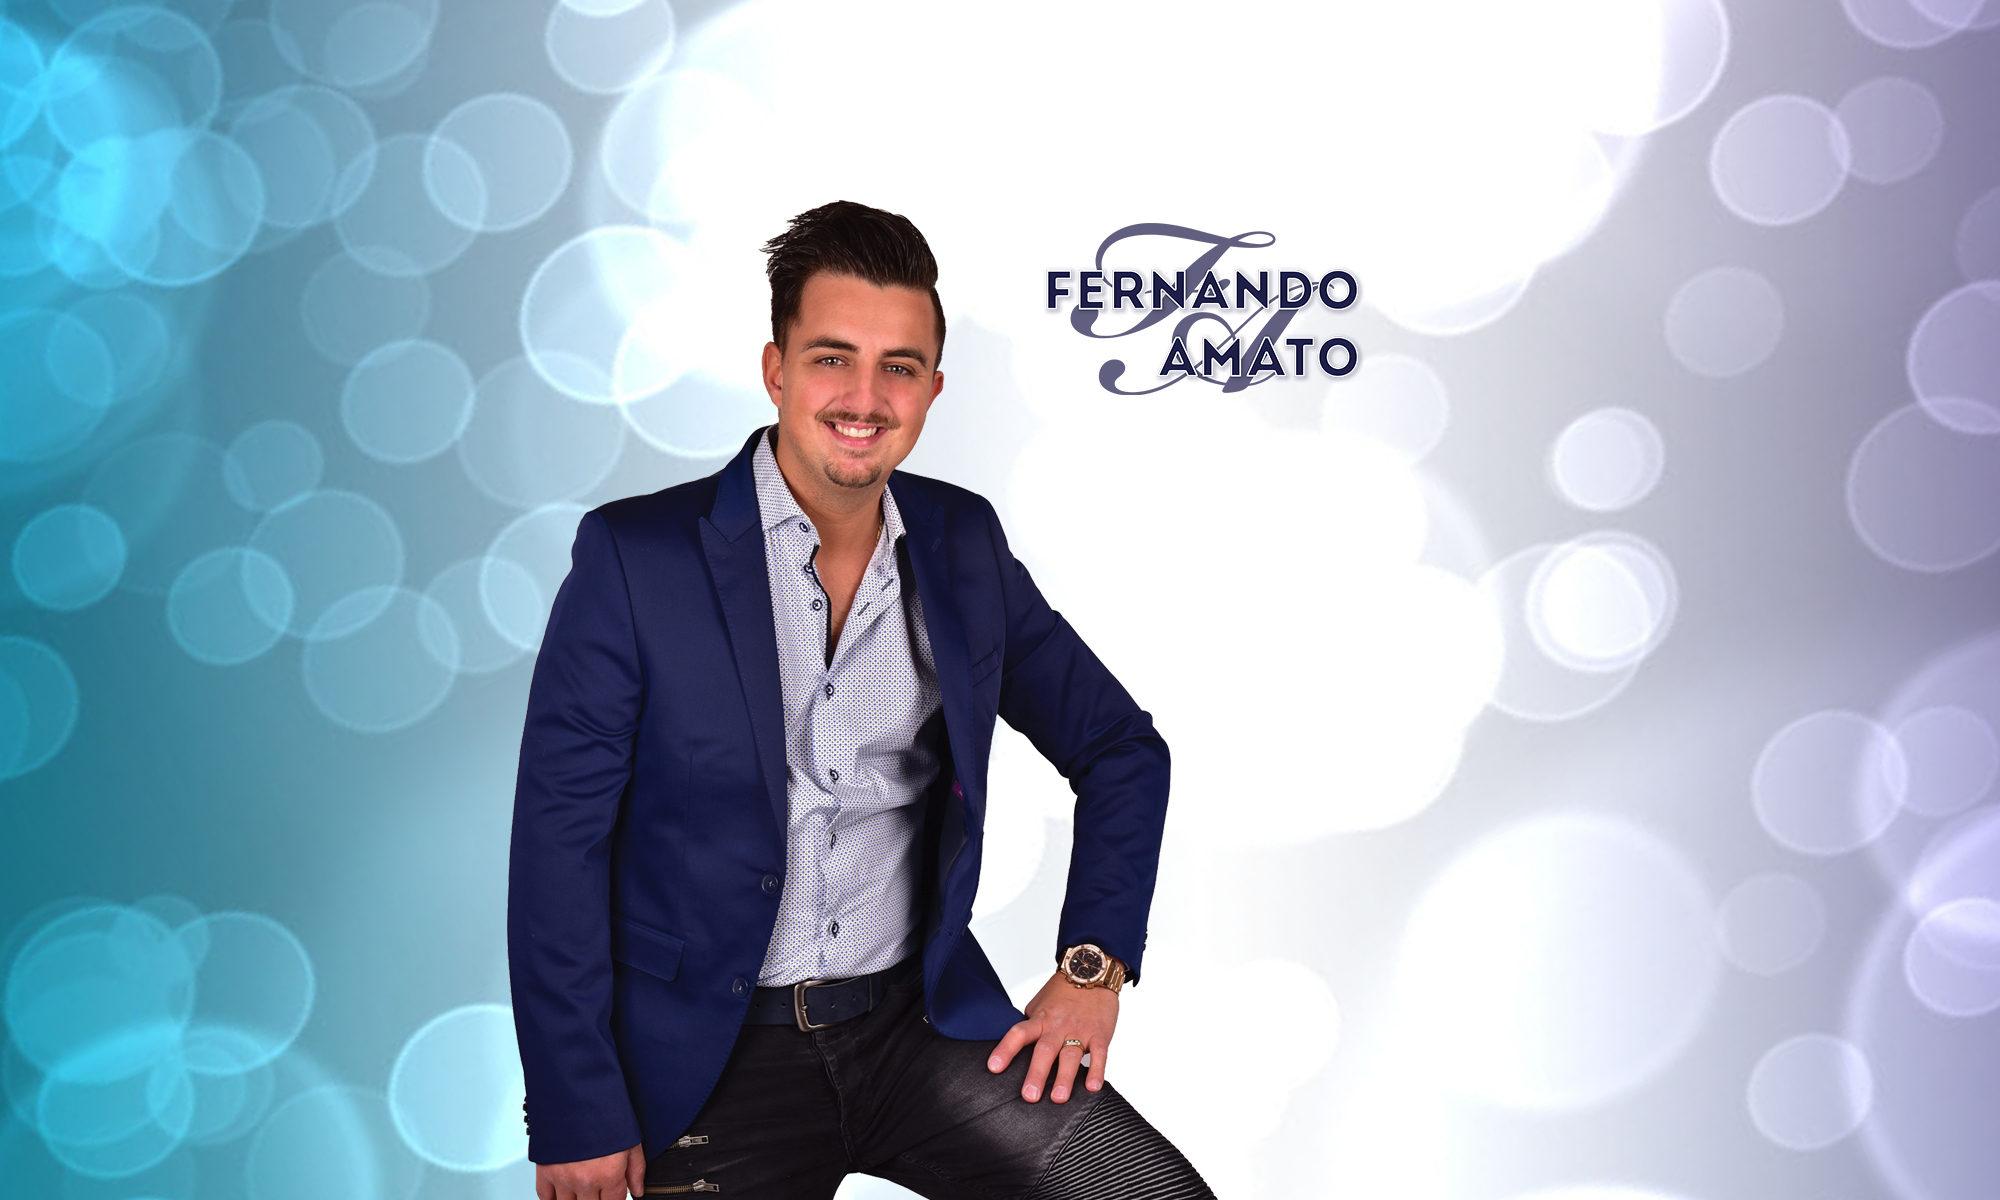 Fernando Amato